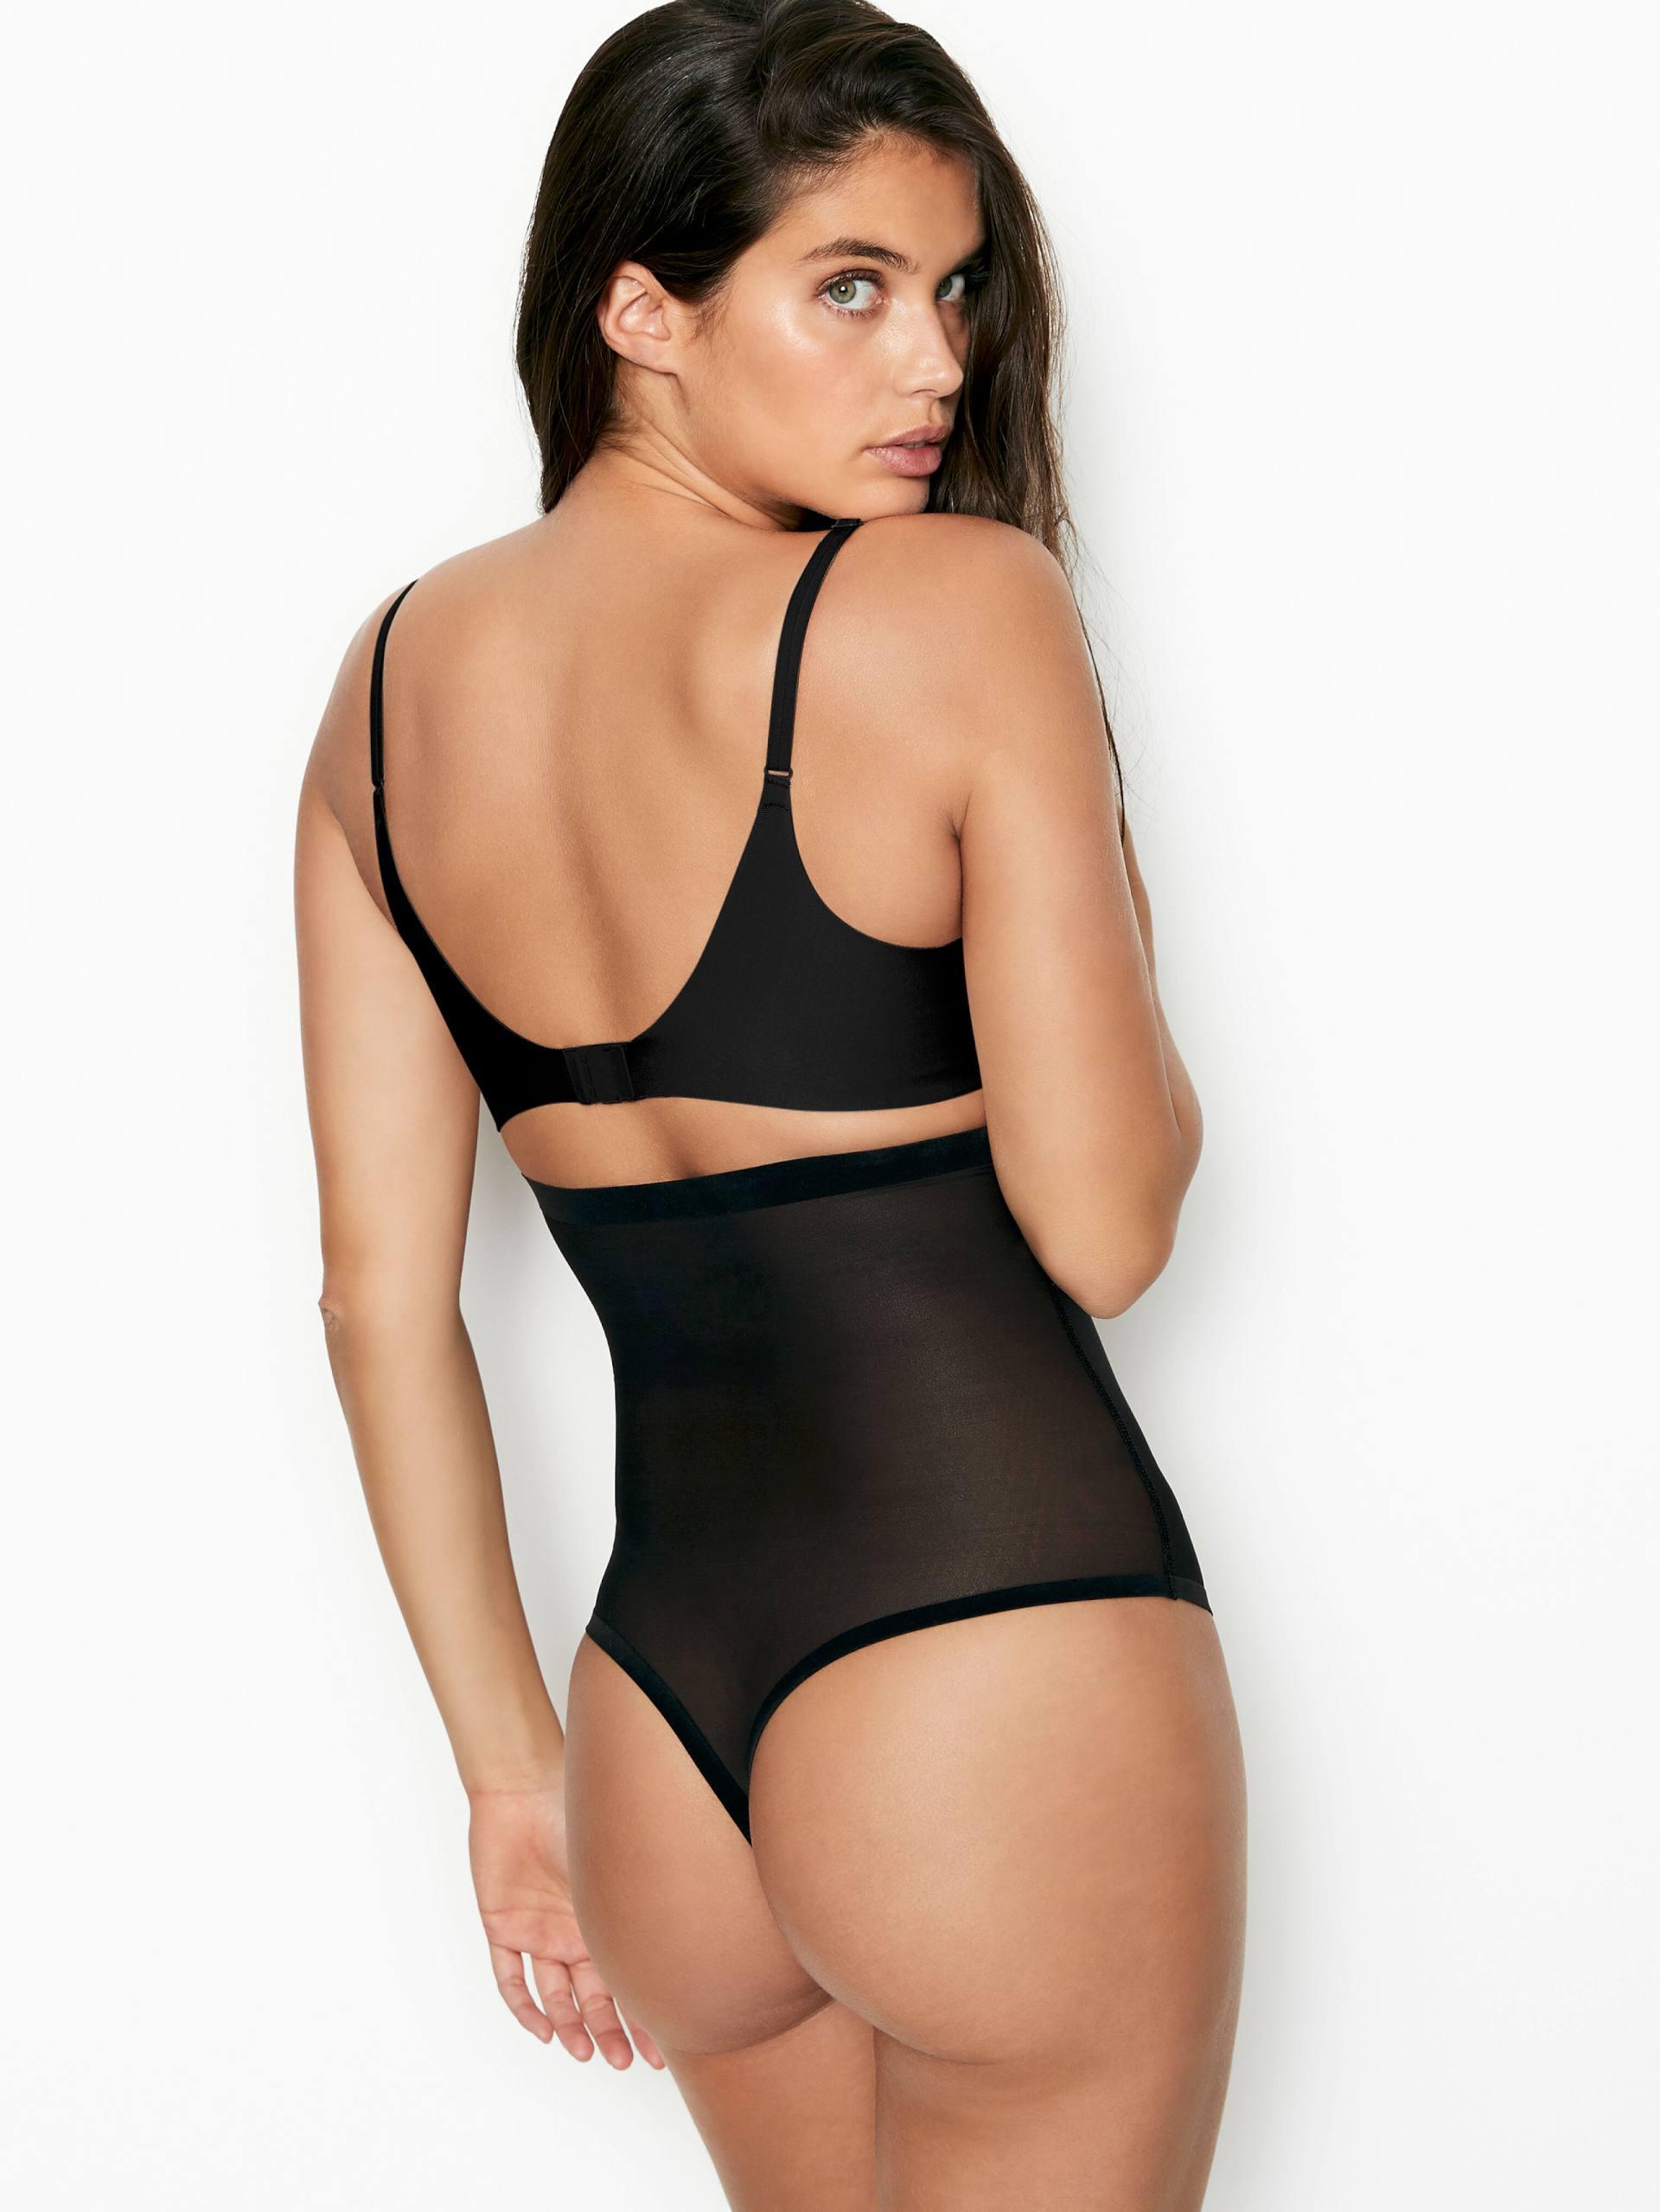 Sara Sampaio Sexy Lingerie